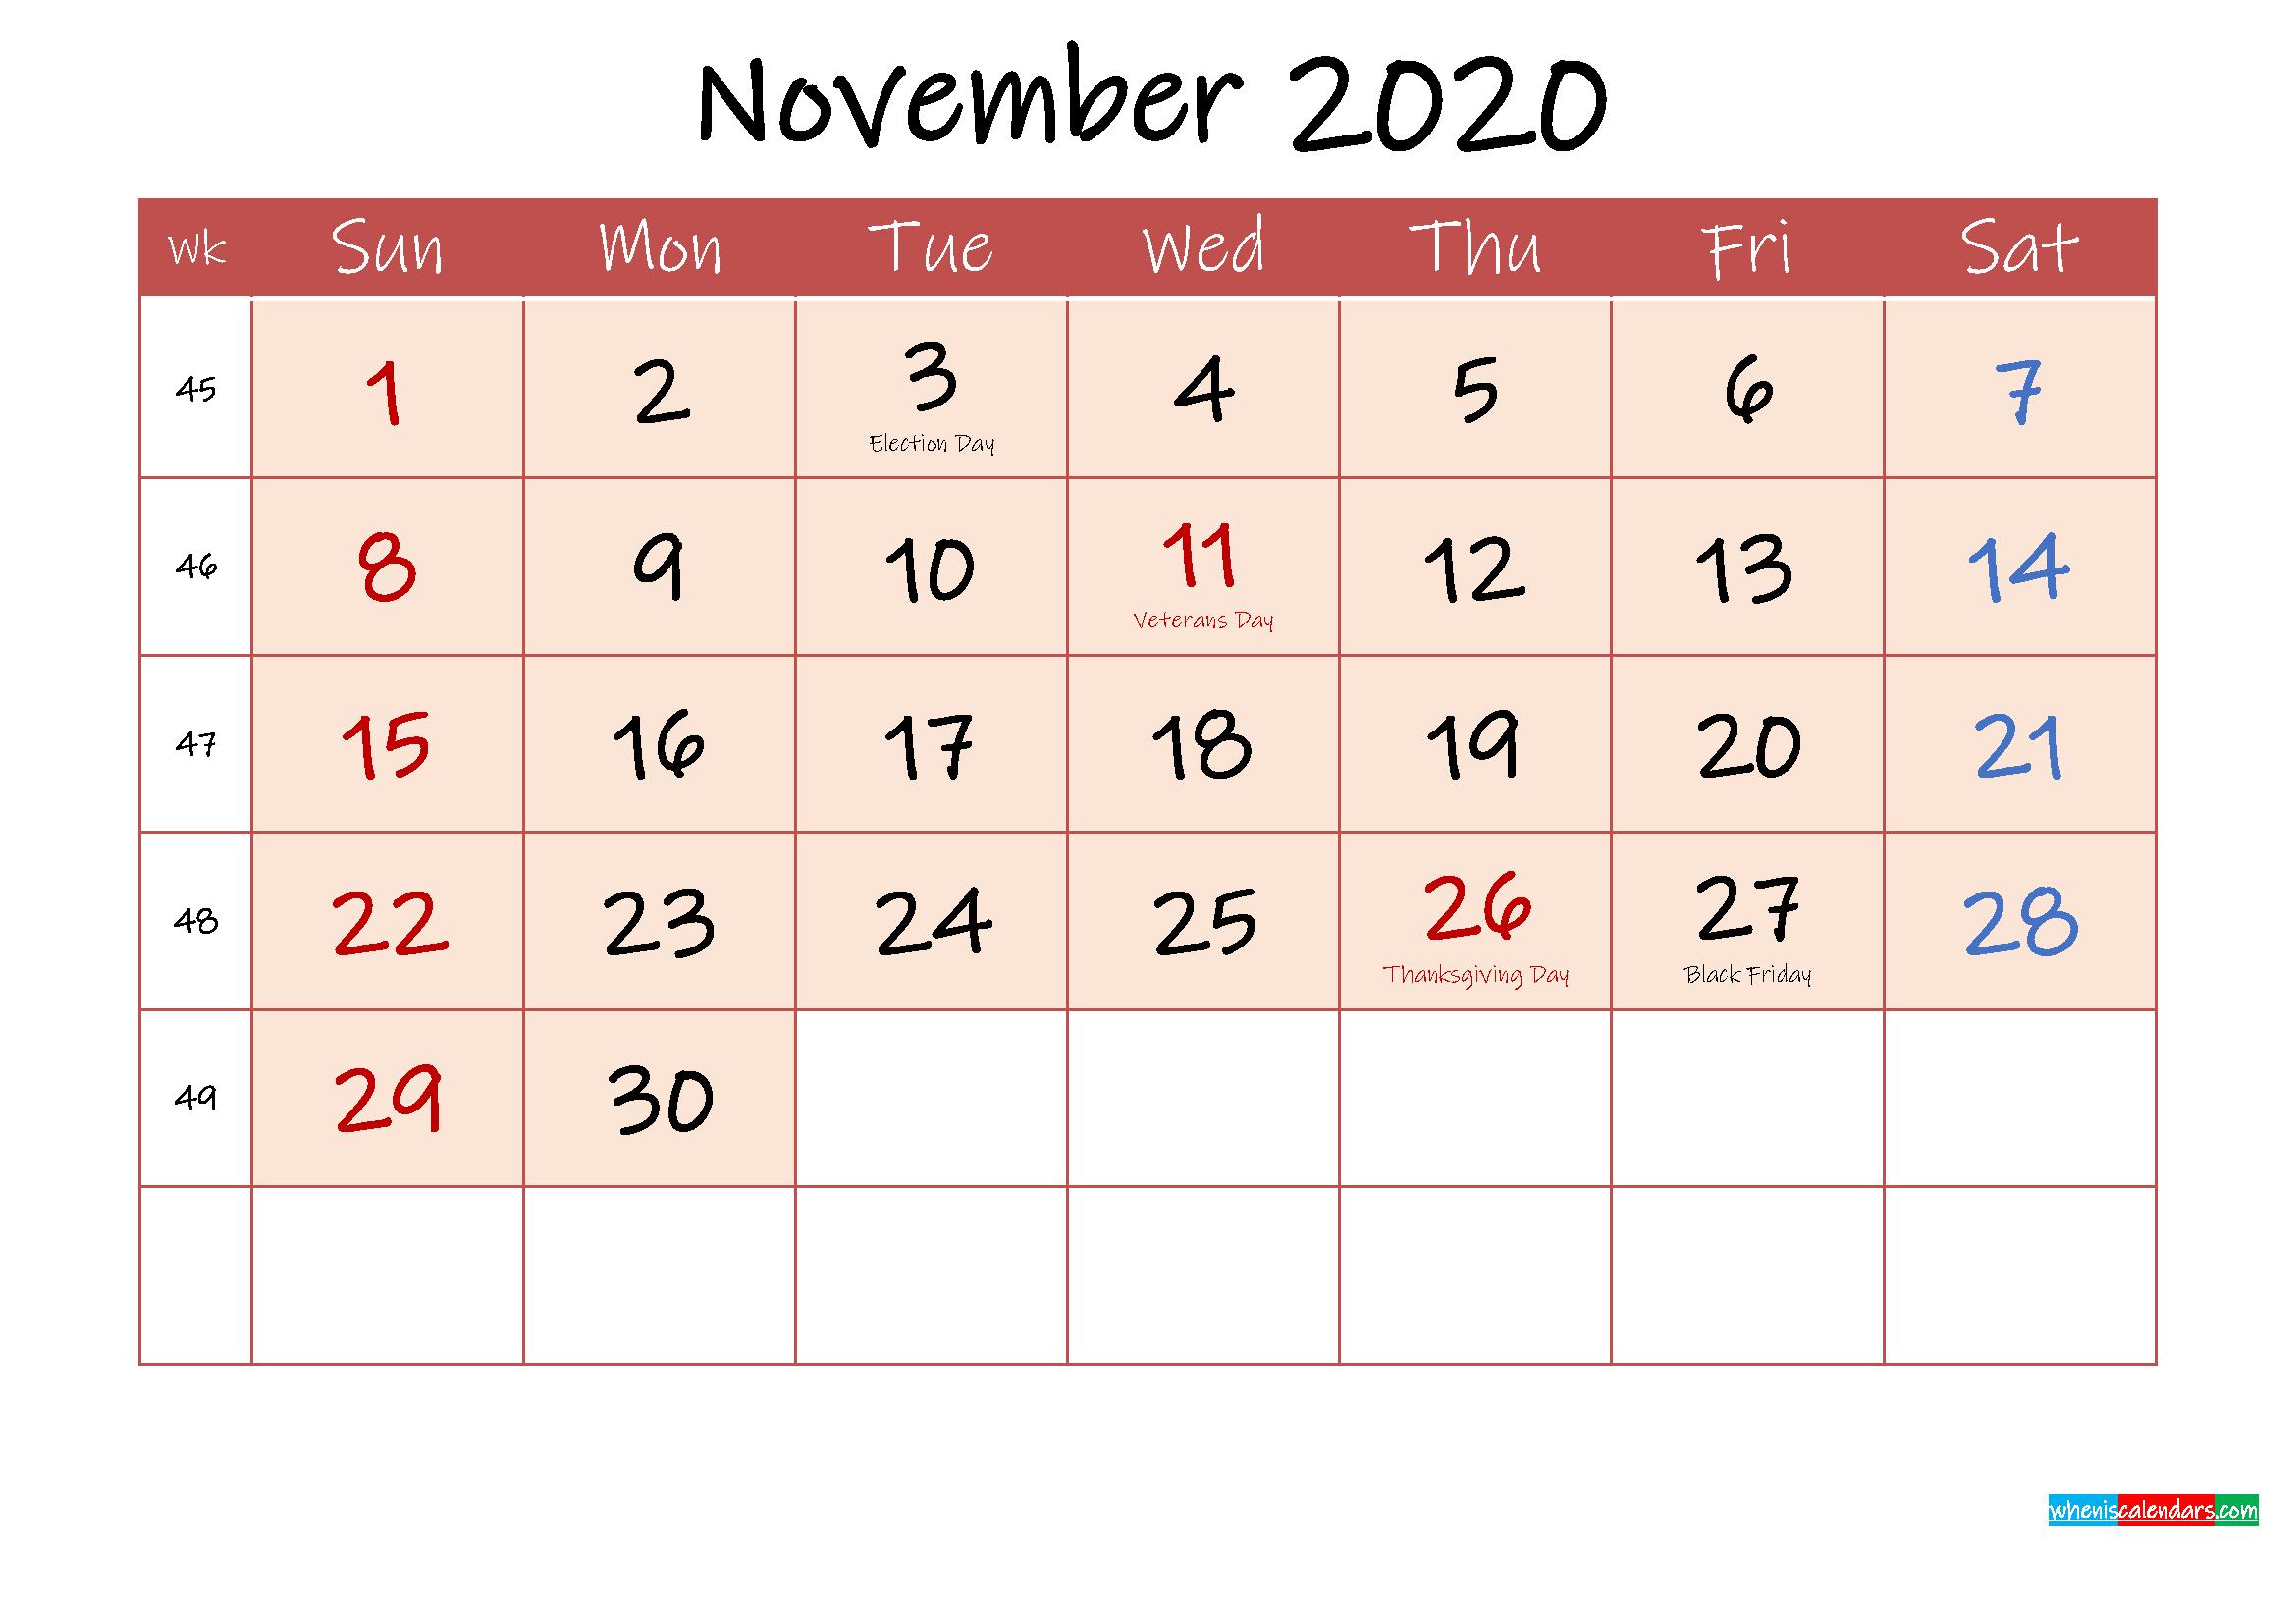 November 2020 Free Printable Calendar with Holidays